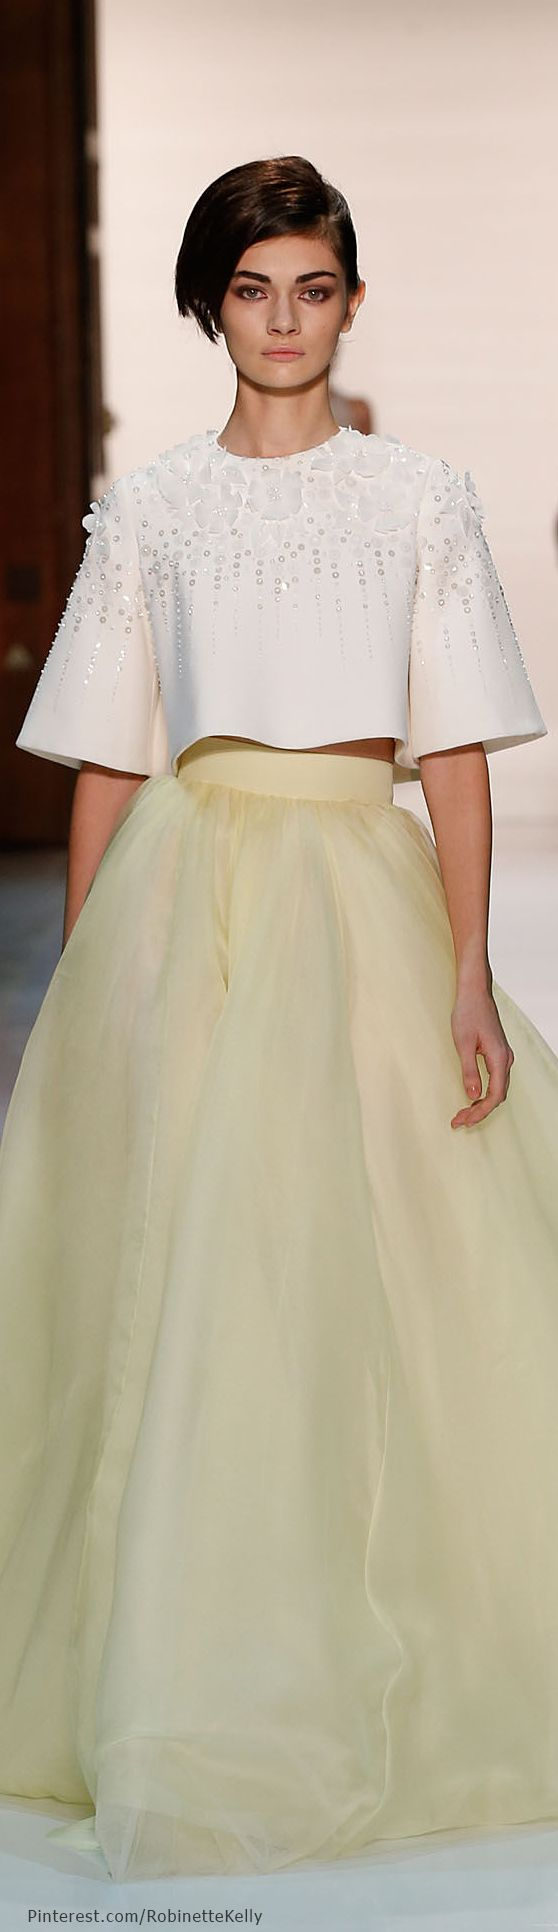 Georges Hobieka Haute Couture   S/S 2014